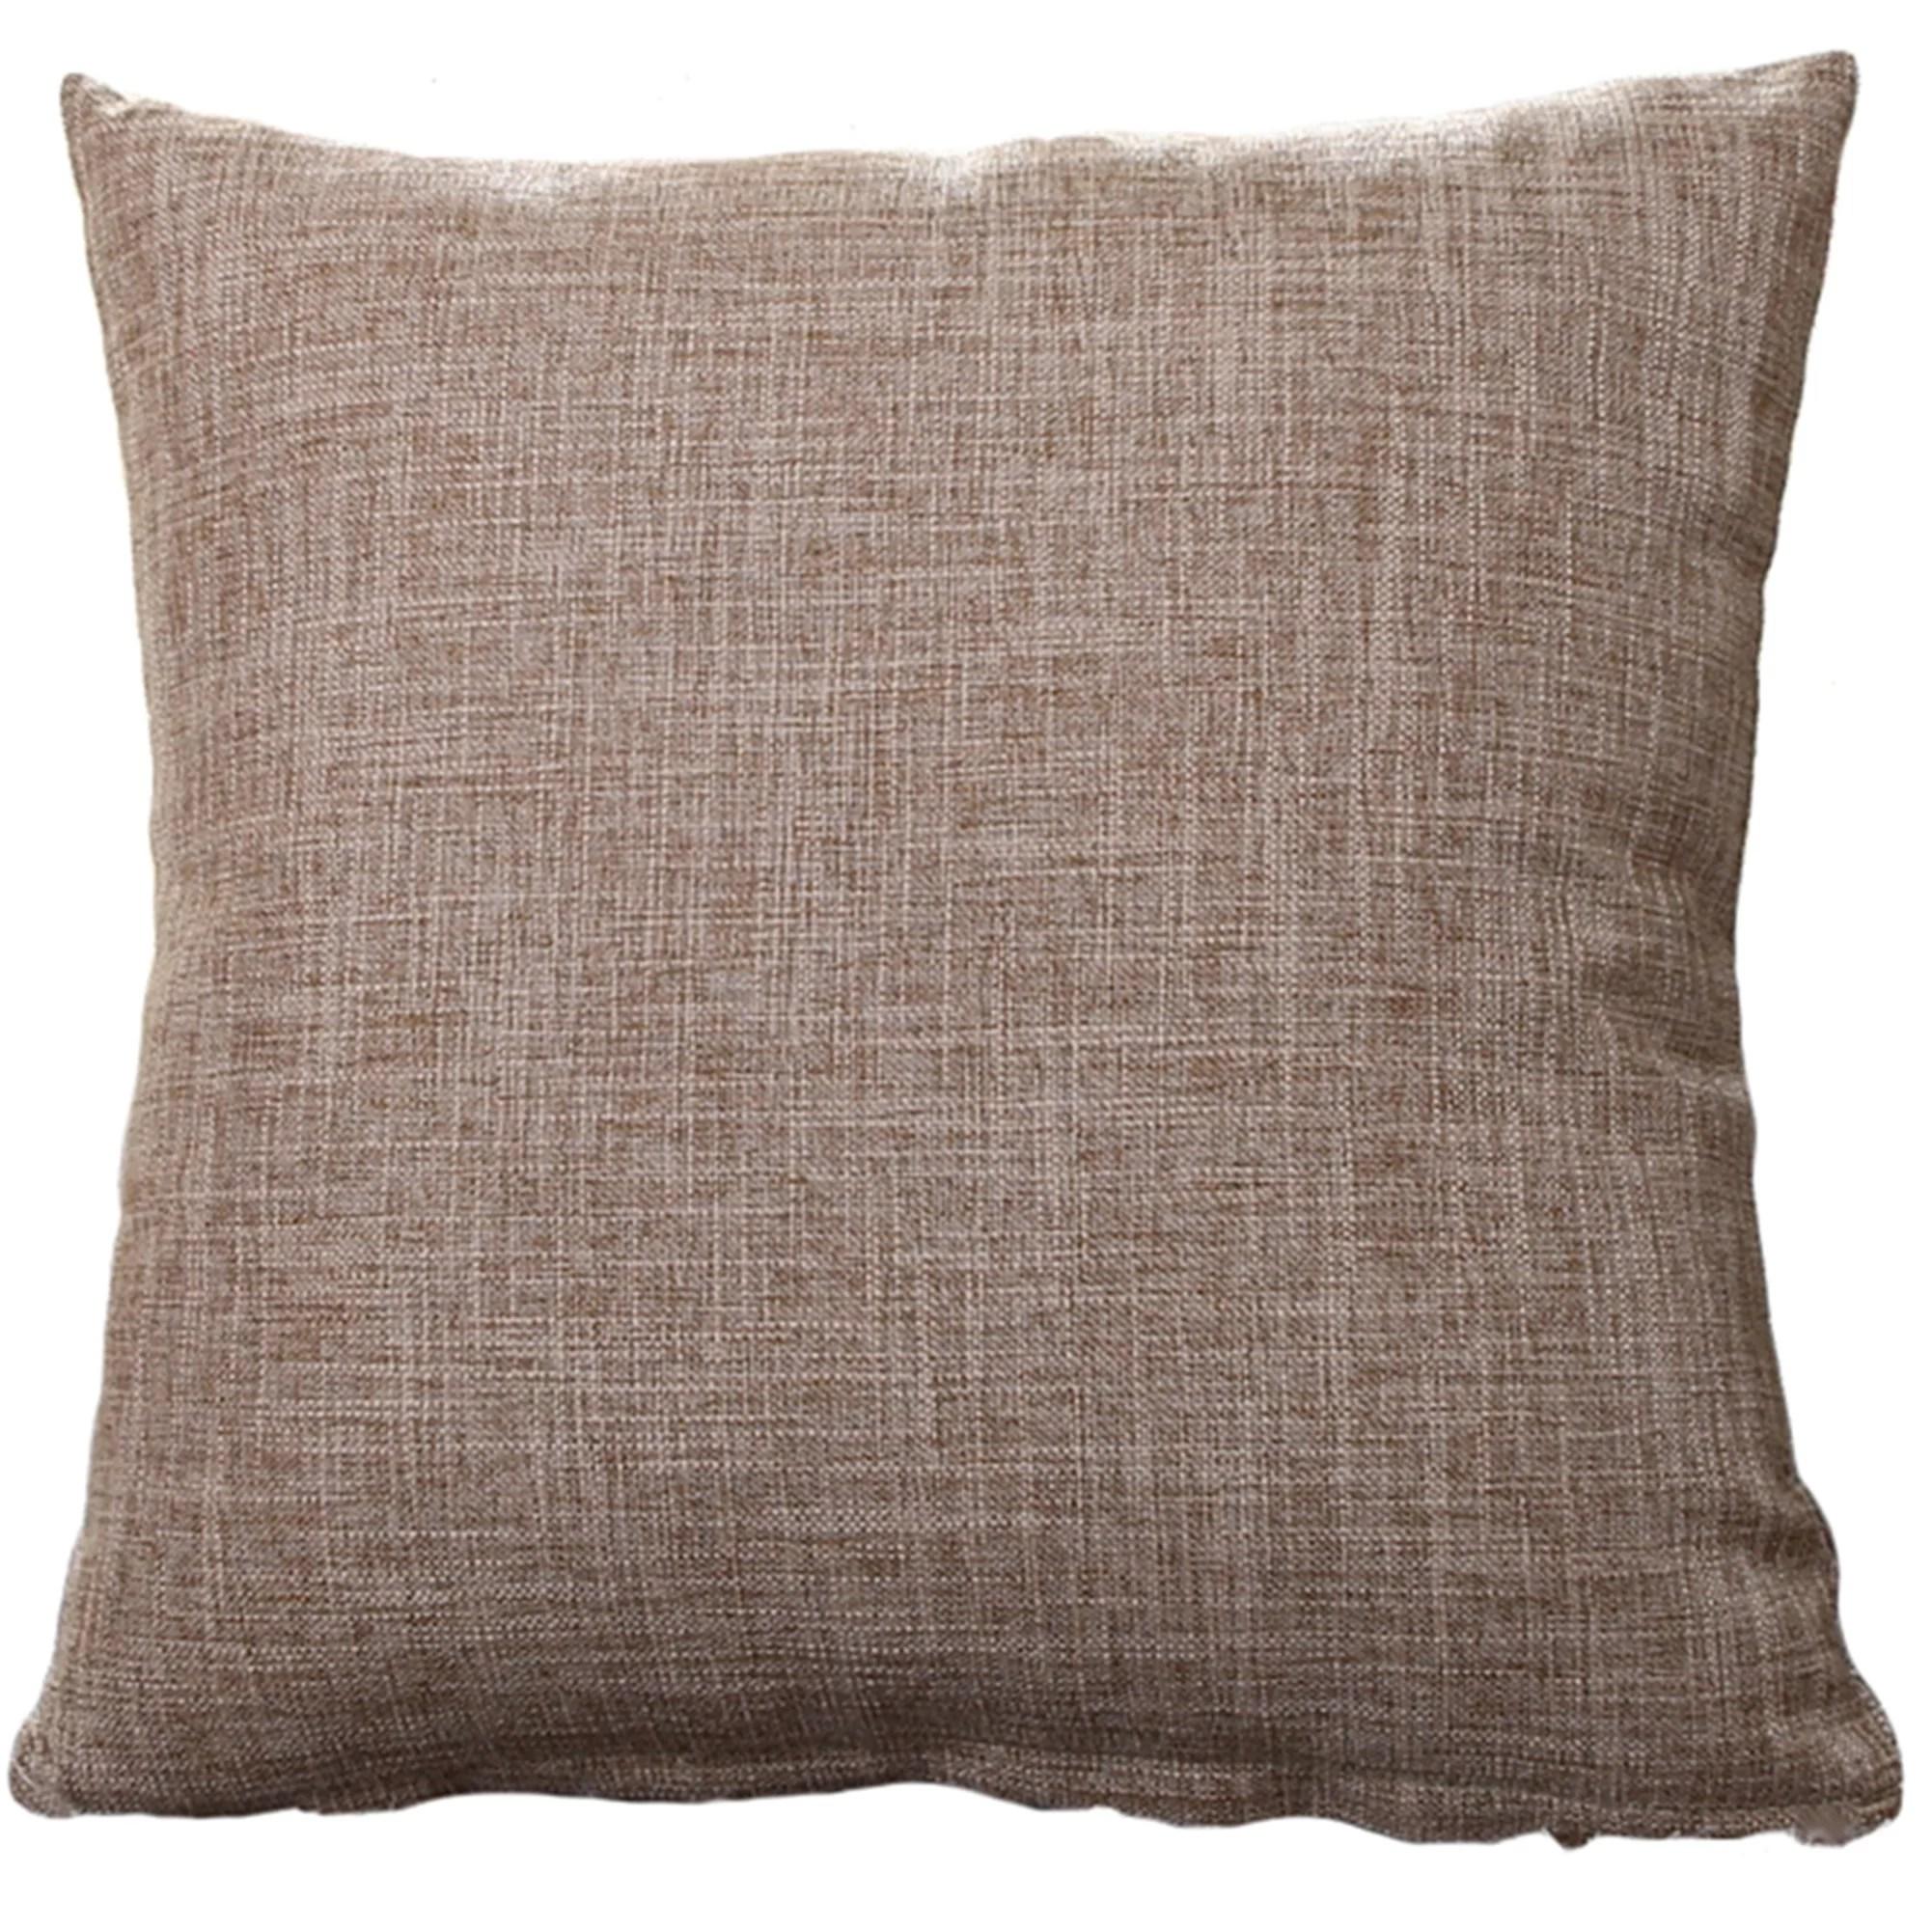 Beige Throw Pillows You Ll Love In 2020 Wayfair